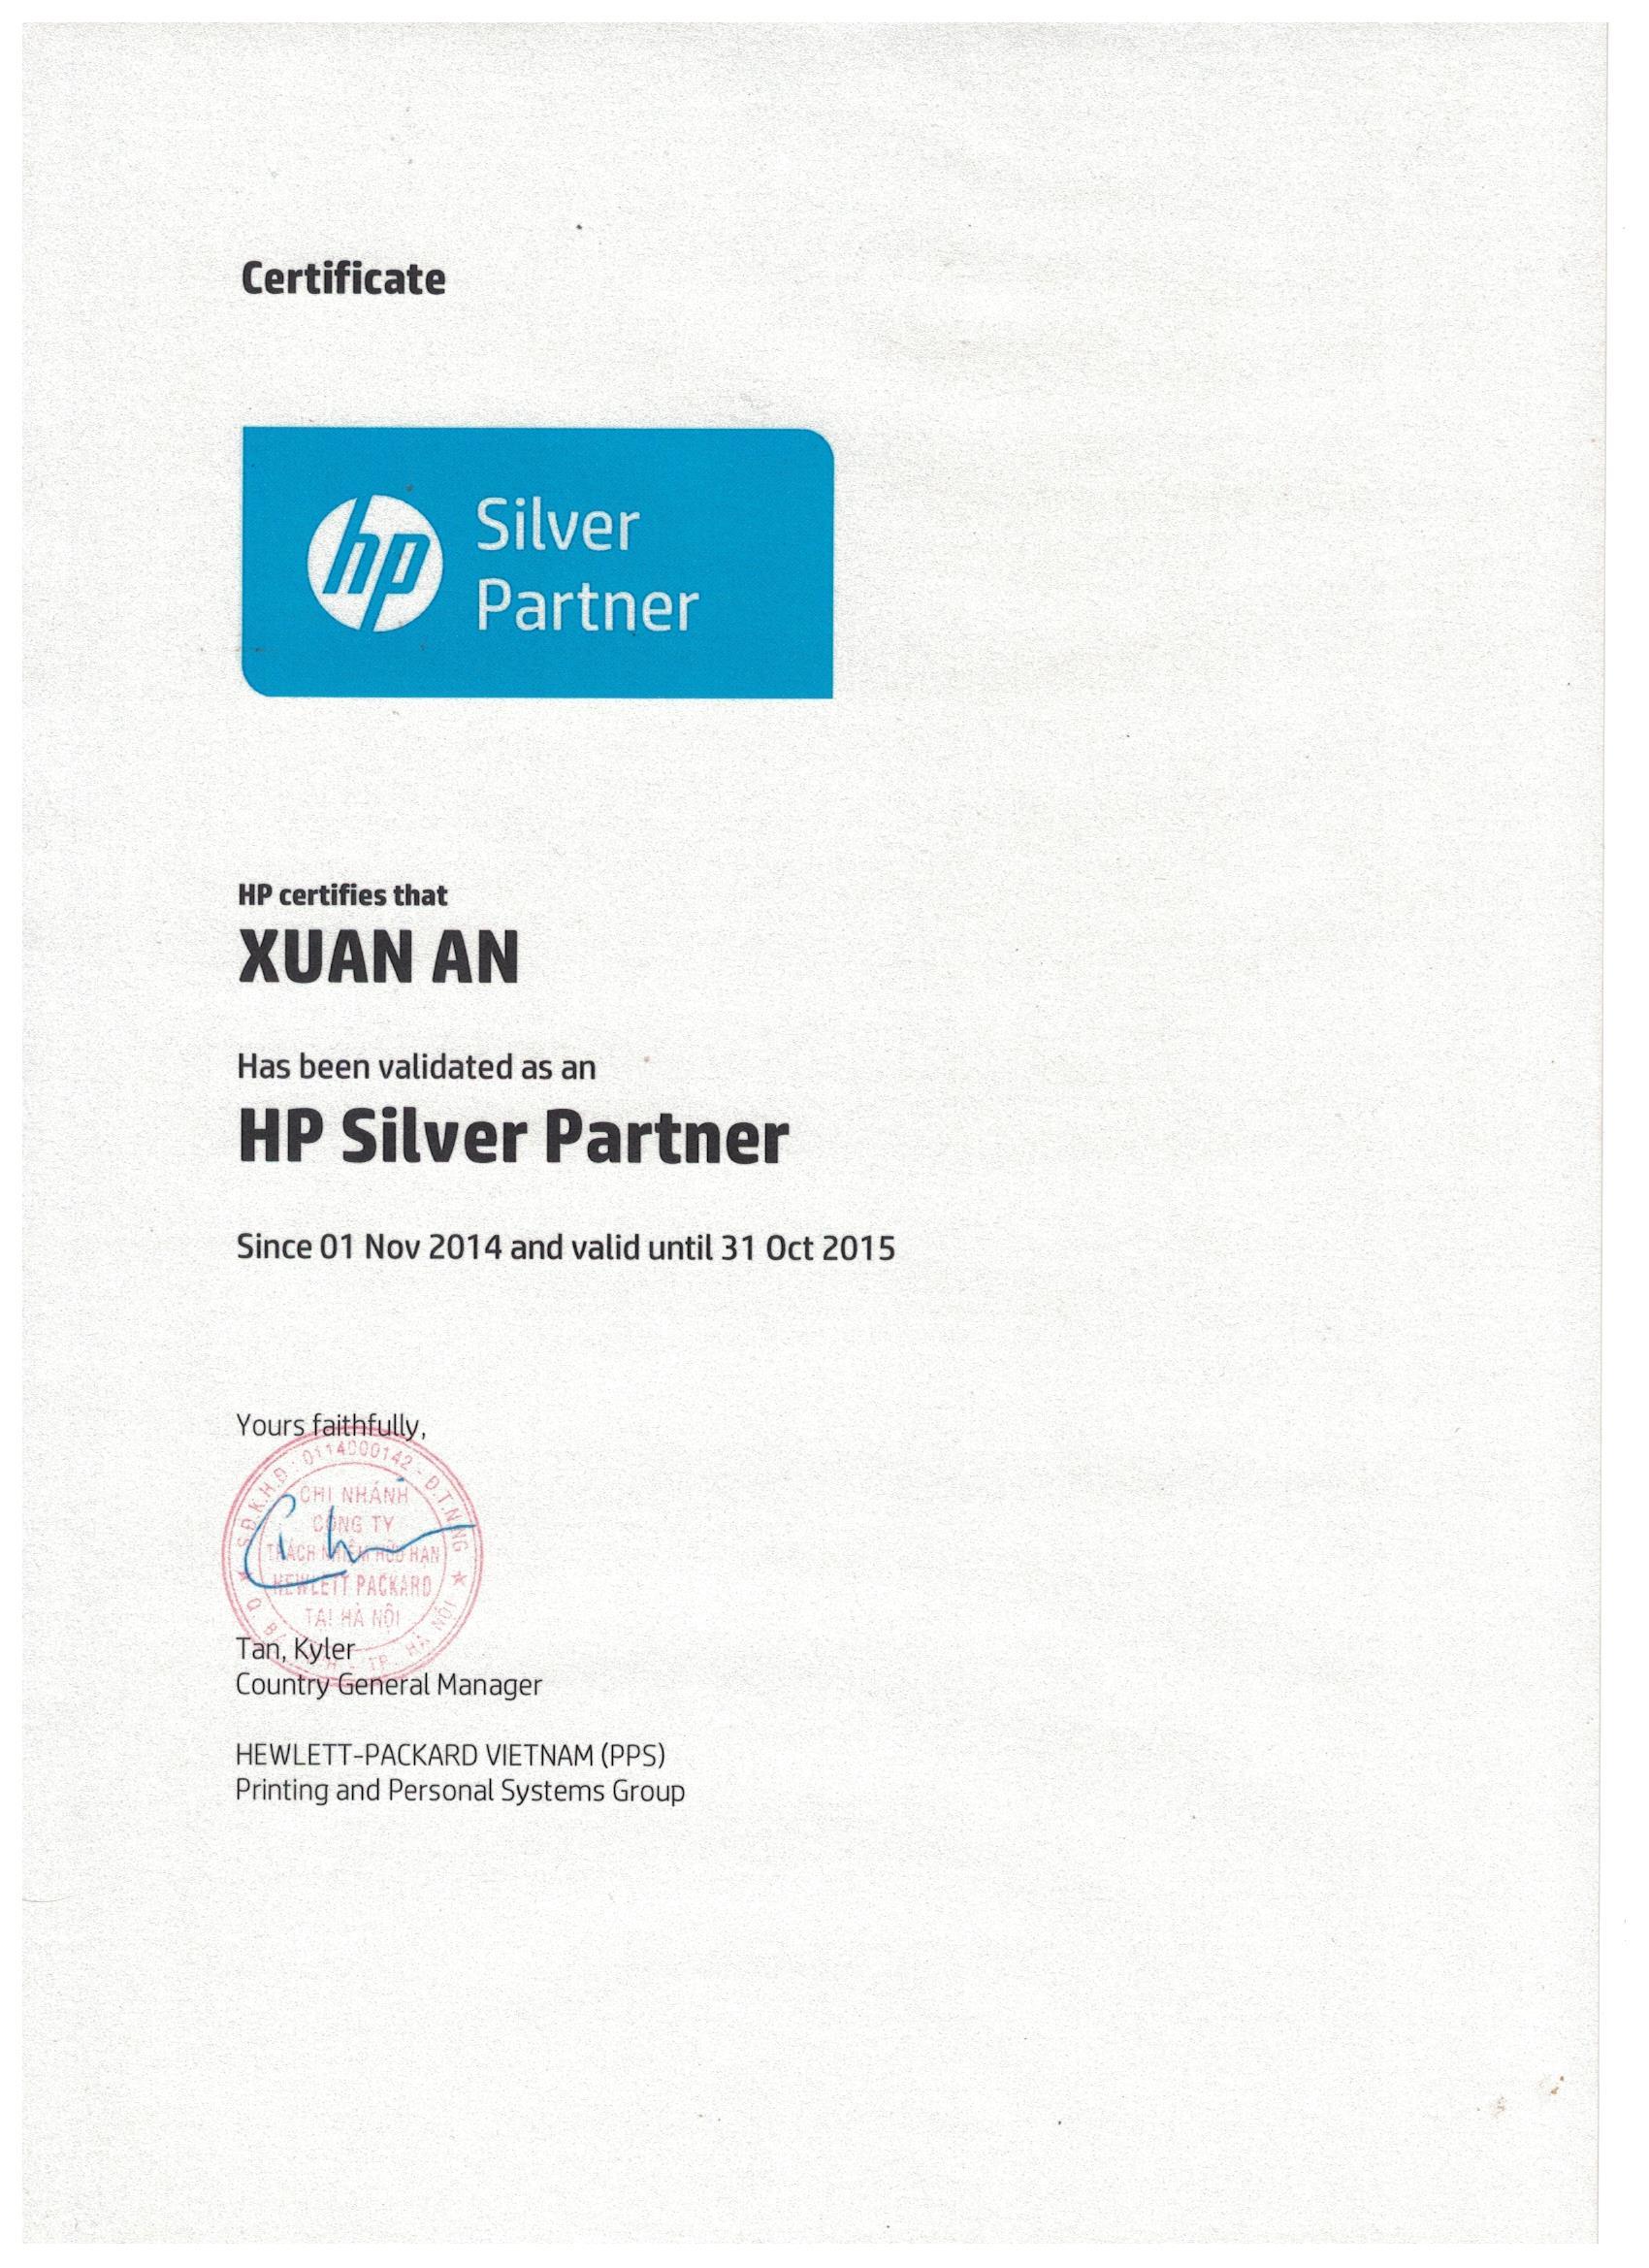 HP Probook 450 G6 - 5YM71PA (Silver)